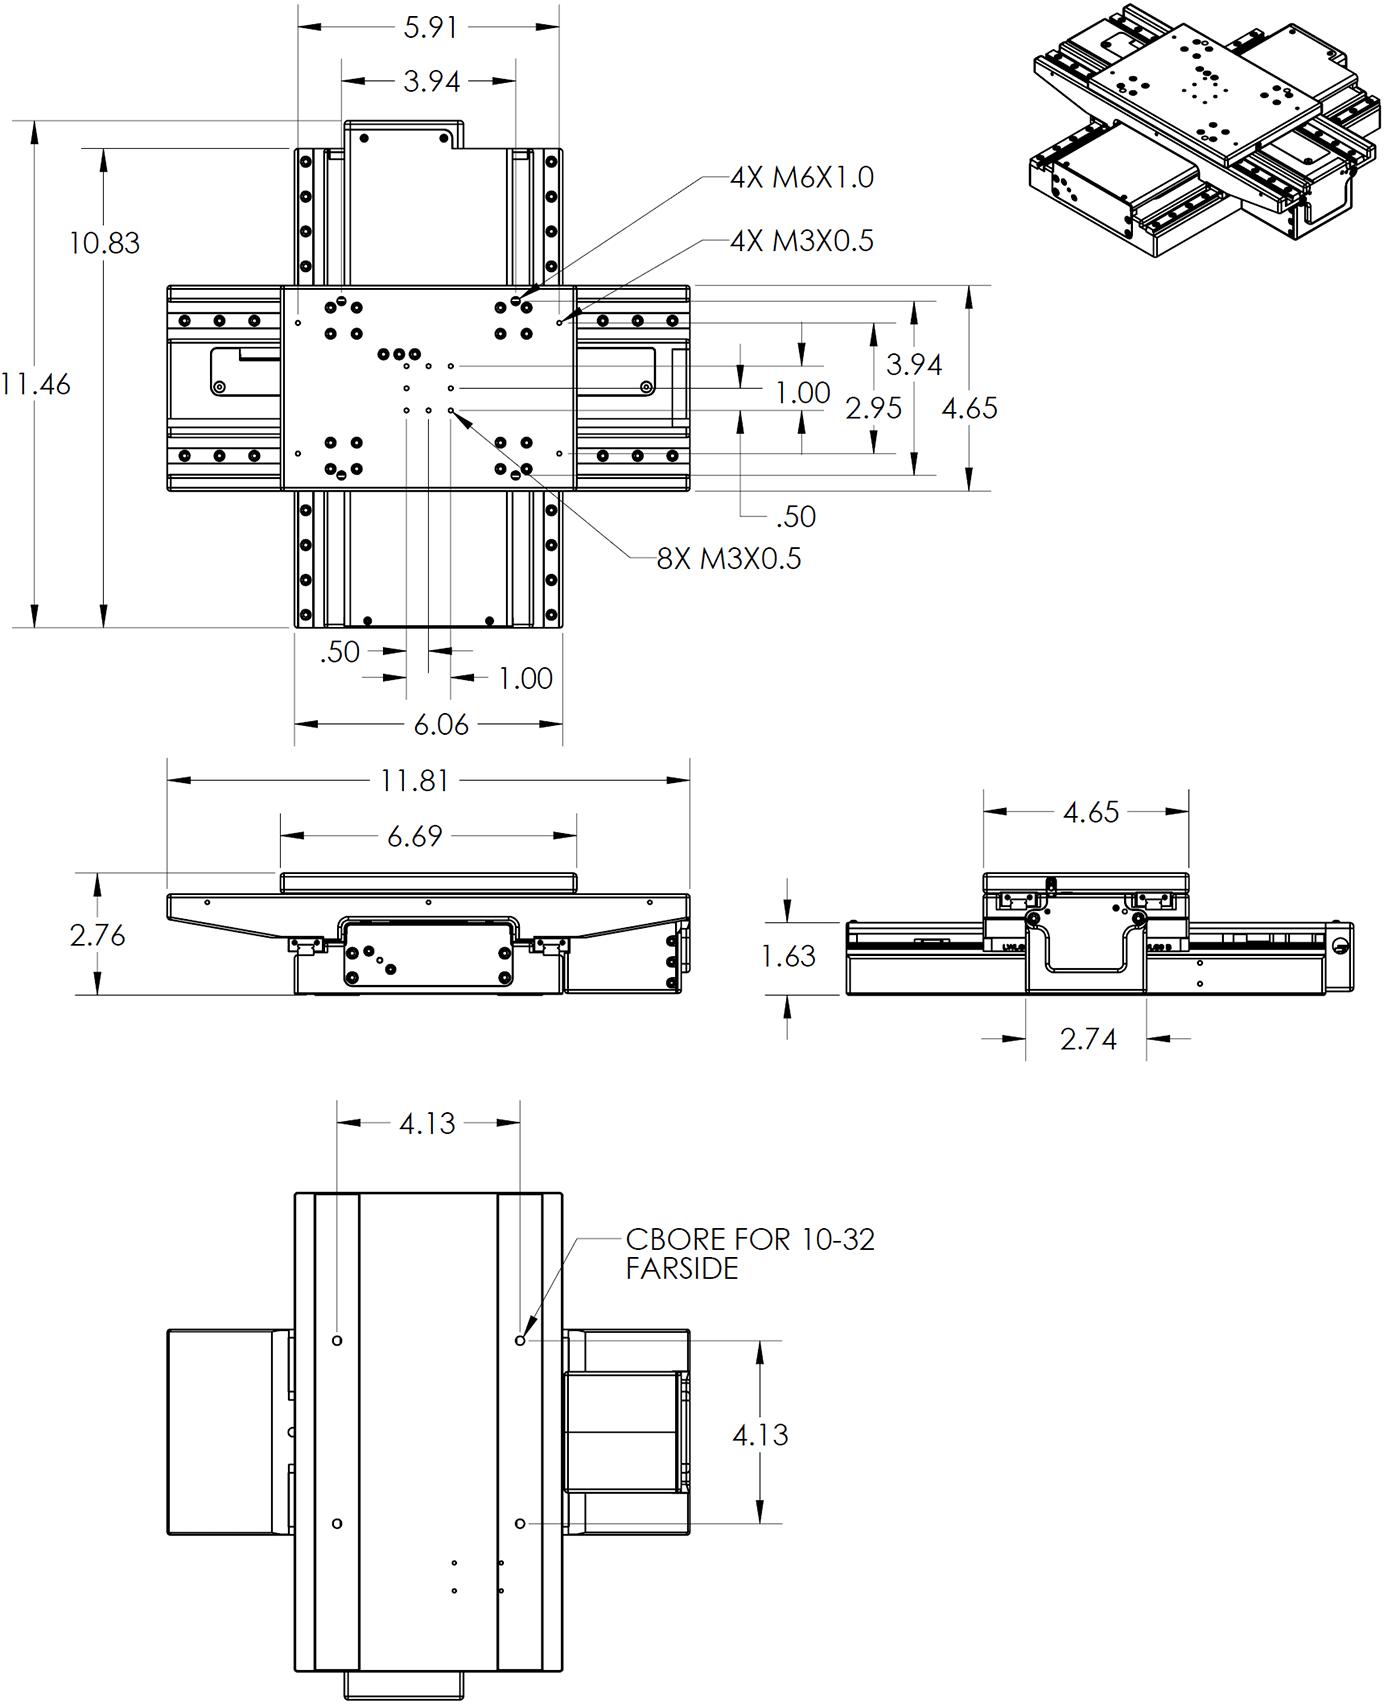 LP150 Low Profile X-Y Stage Dimension Drawings